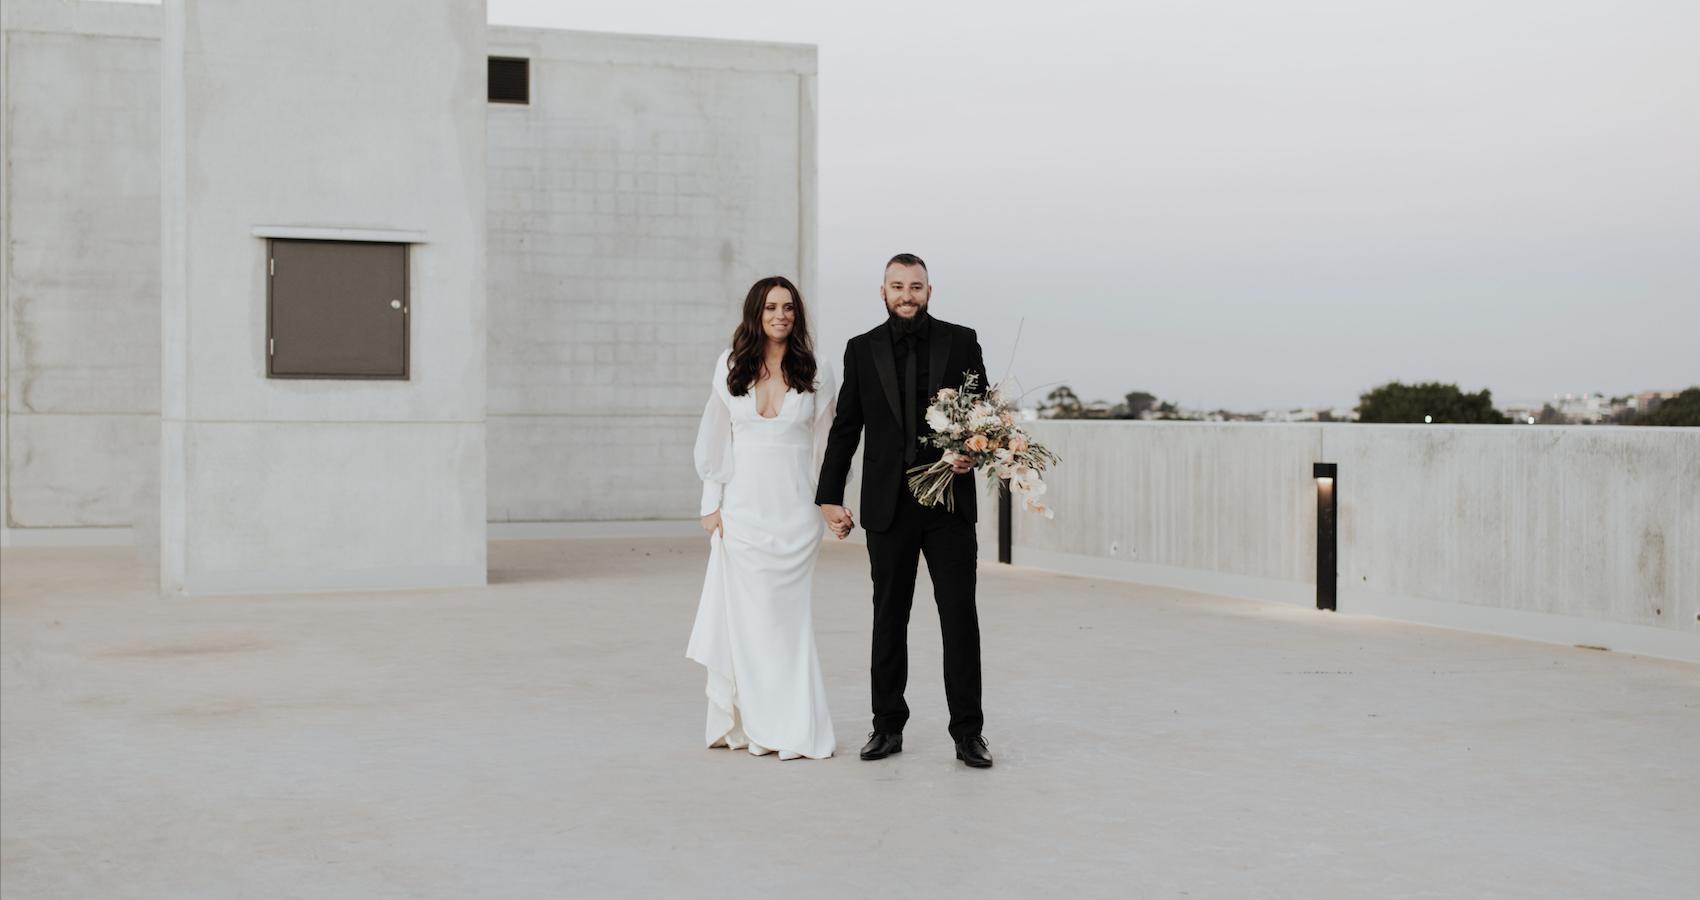 Worst Case Scenario: How To Downsize Your Wedding